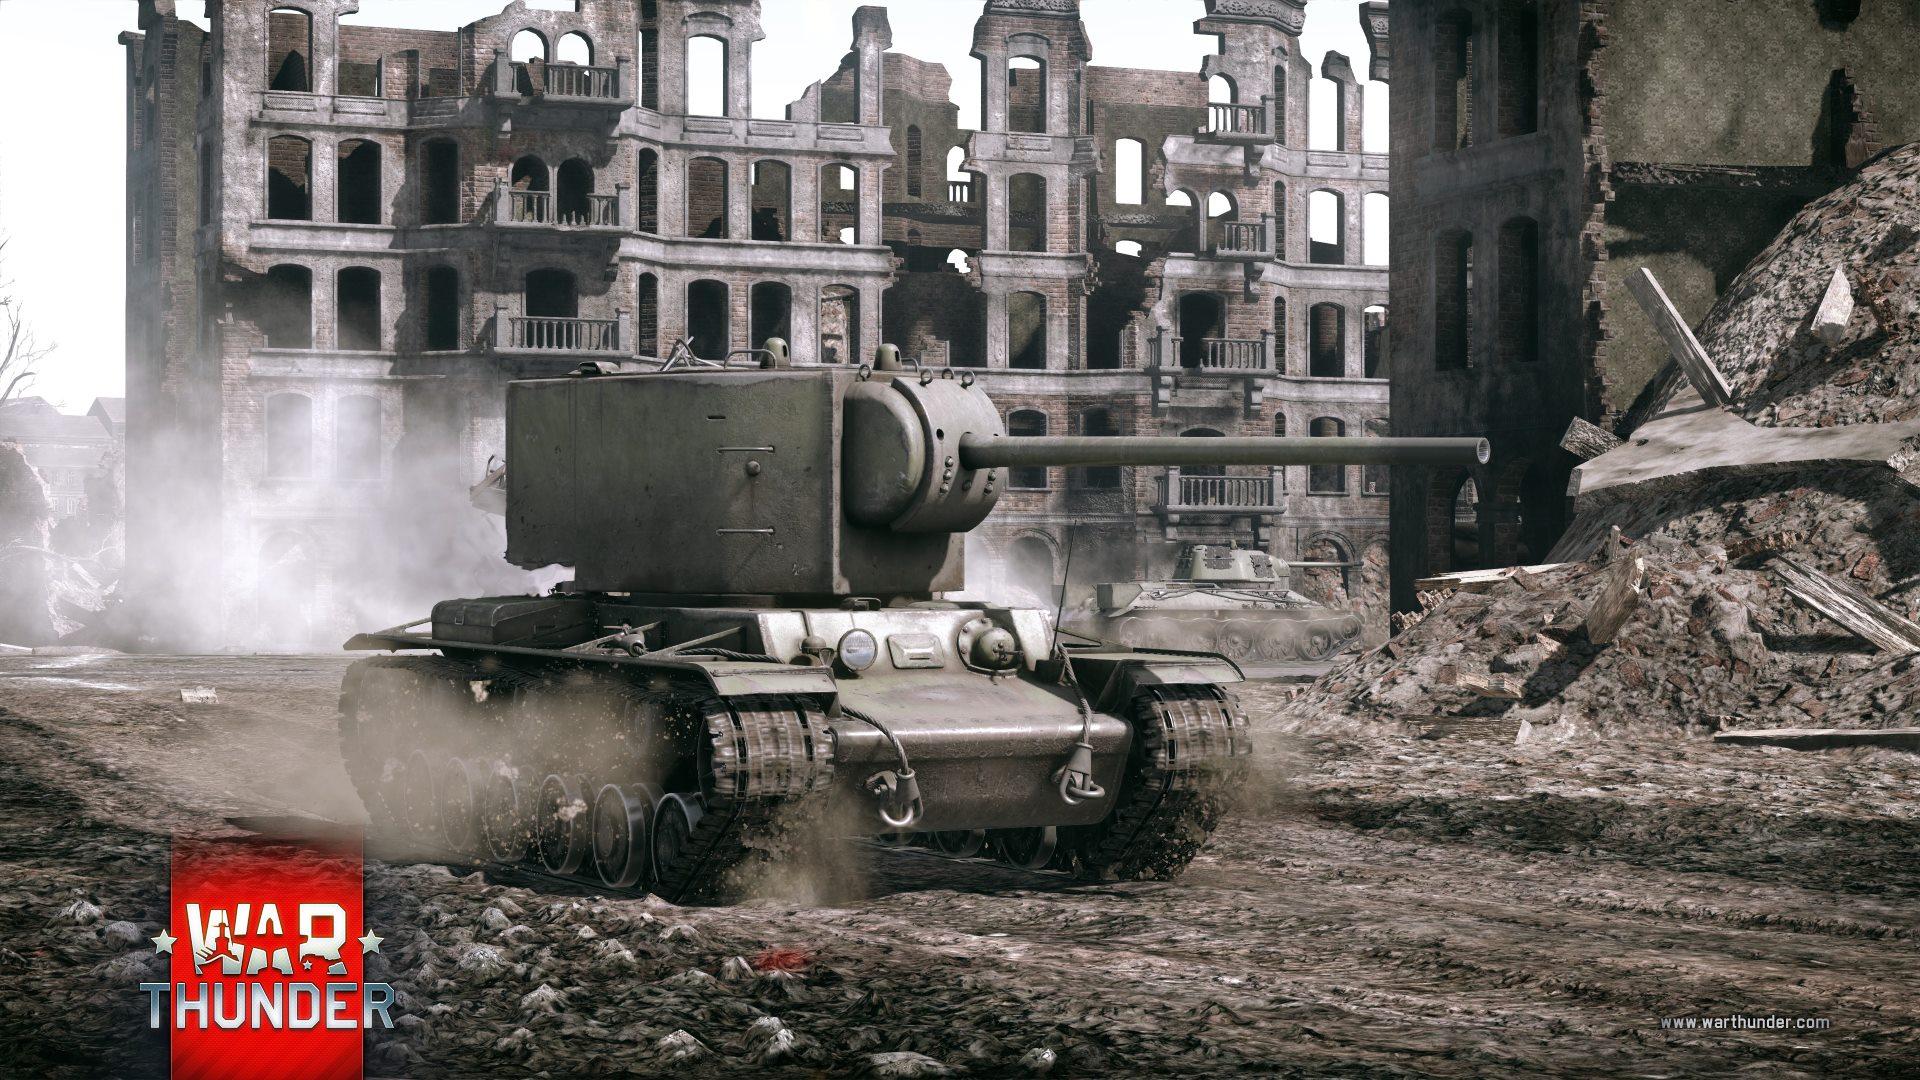 War%20Thunder%2014_f5a0b9c67395ebc43a30c